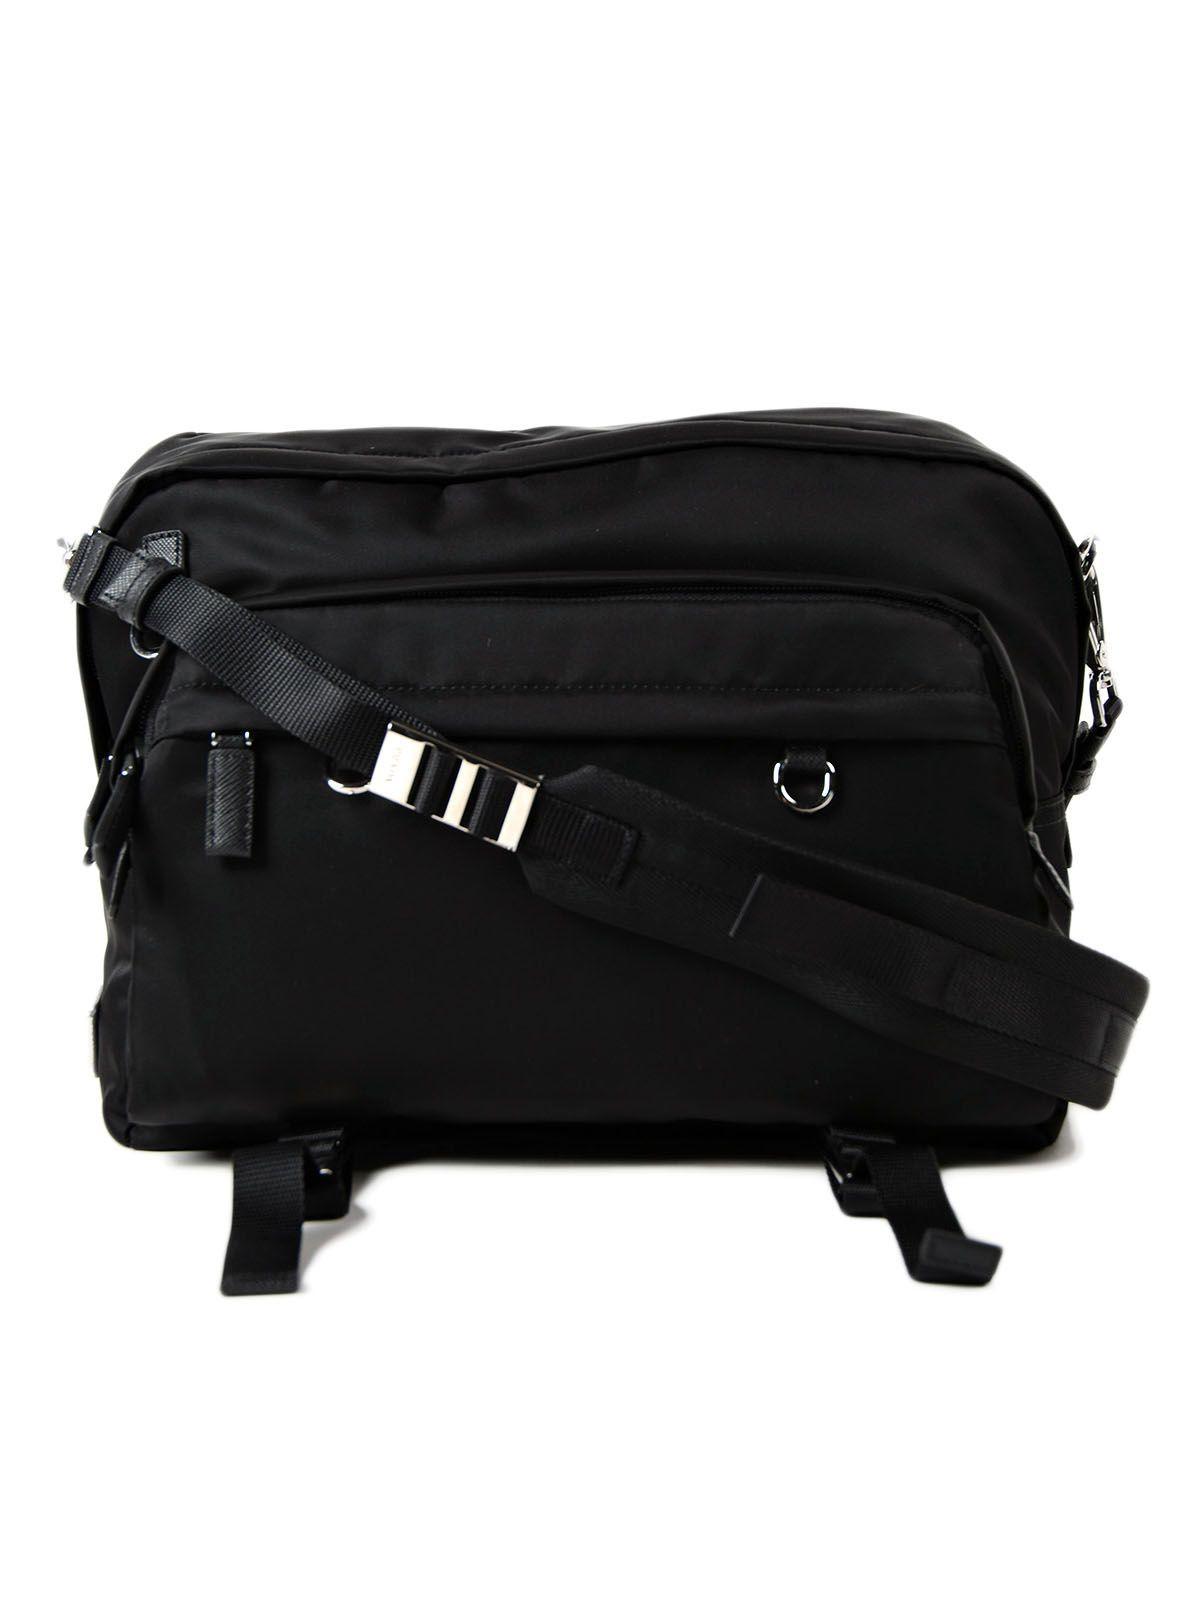 f36c242427a0 PRADA .  prada  bags  shoulder bags  crossbody